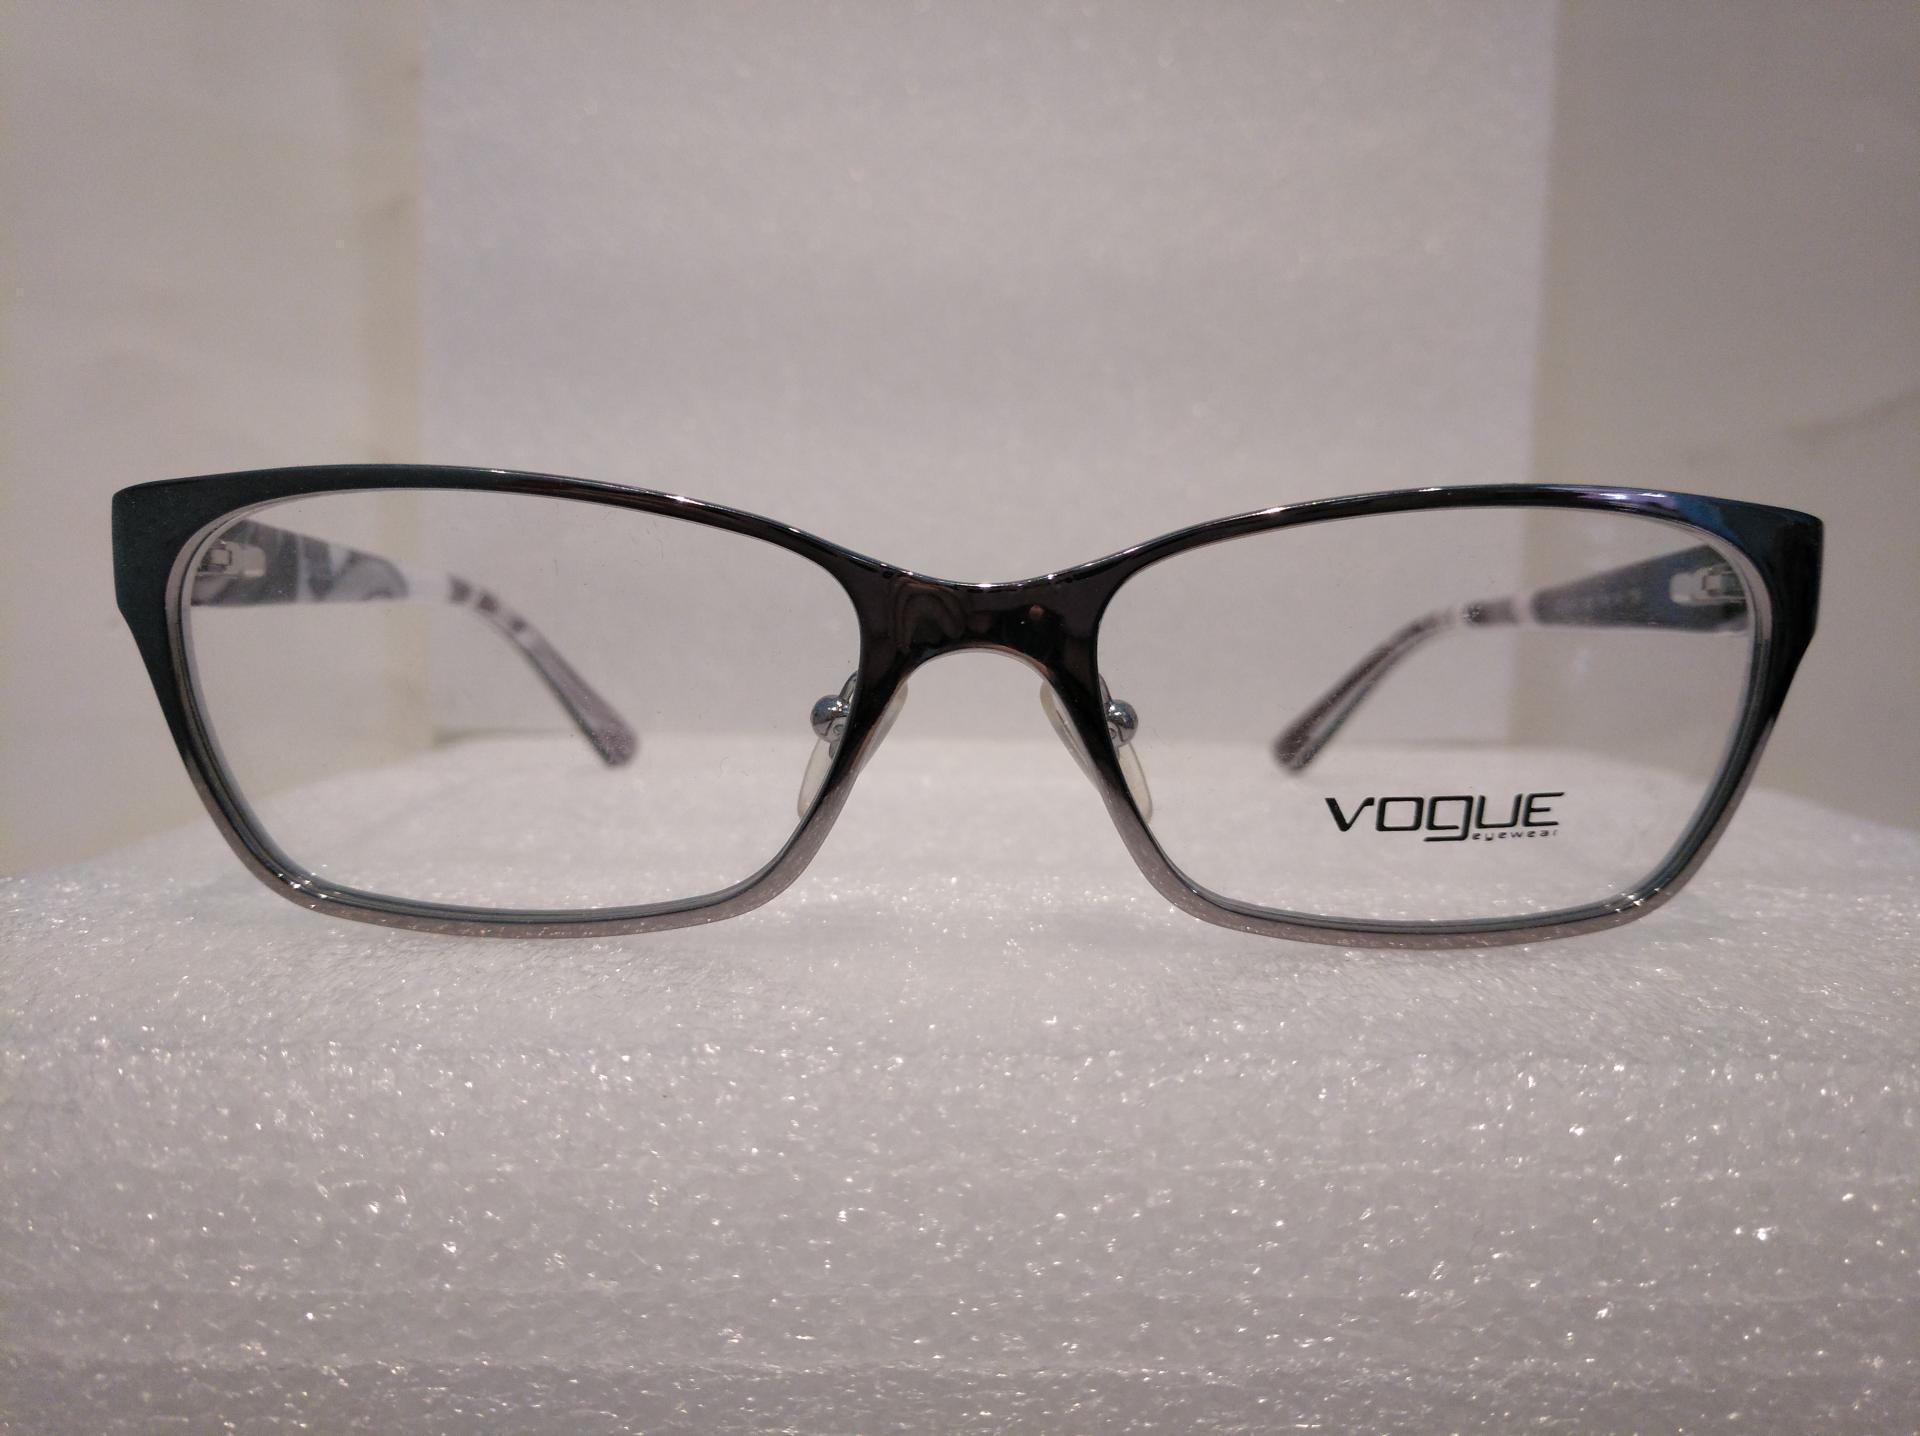 Vogue 3816